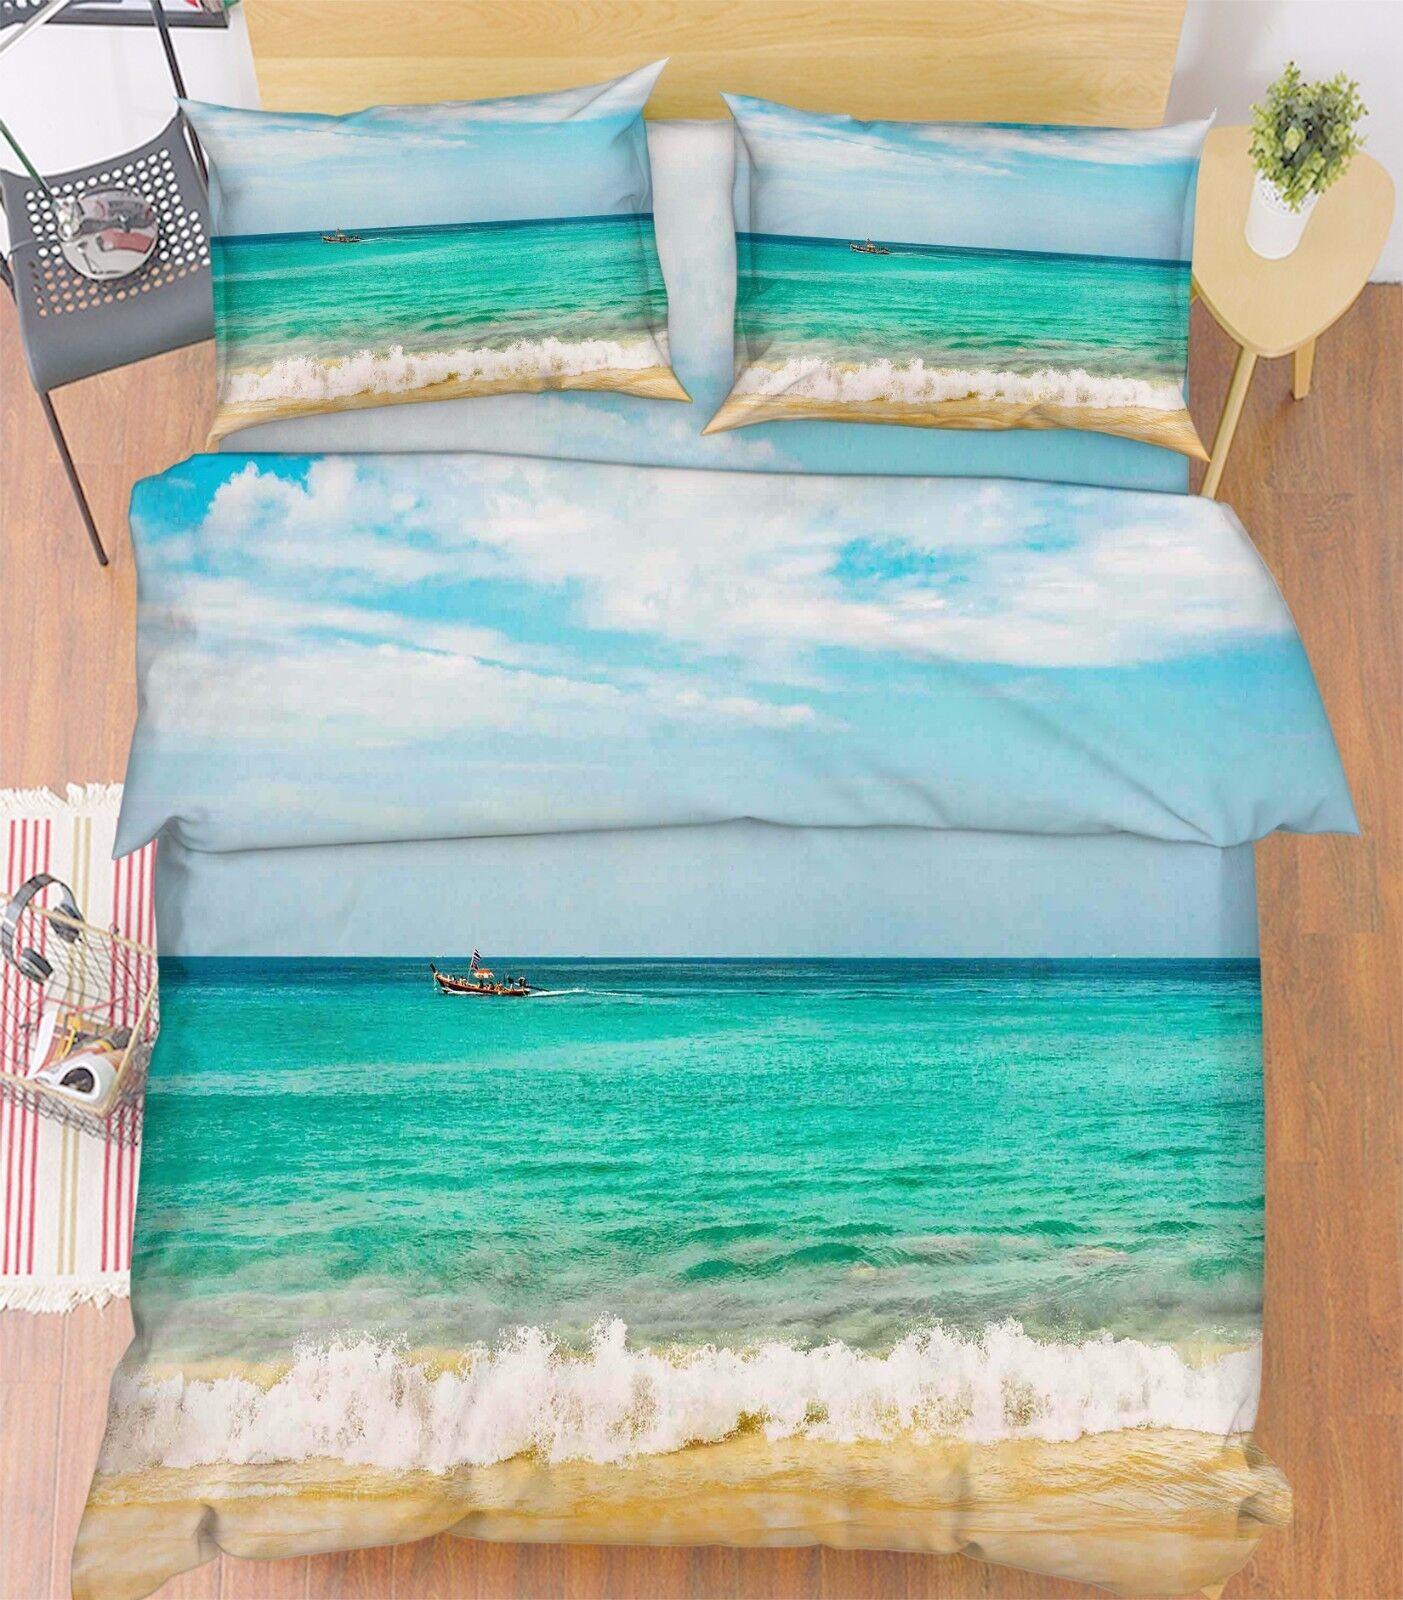 3D Waves Boat Sky 814 Bed Pillowcases Quilt Duvet Cover Set Single Queen UK Kyra